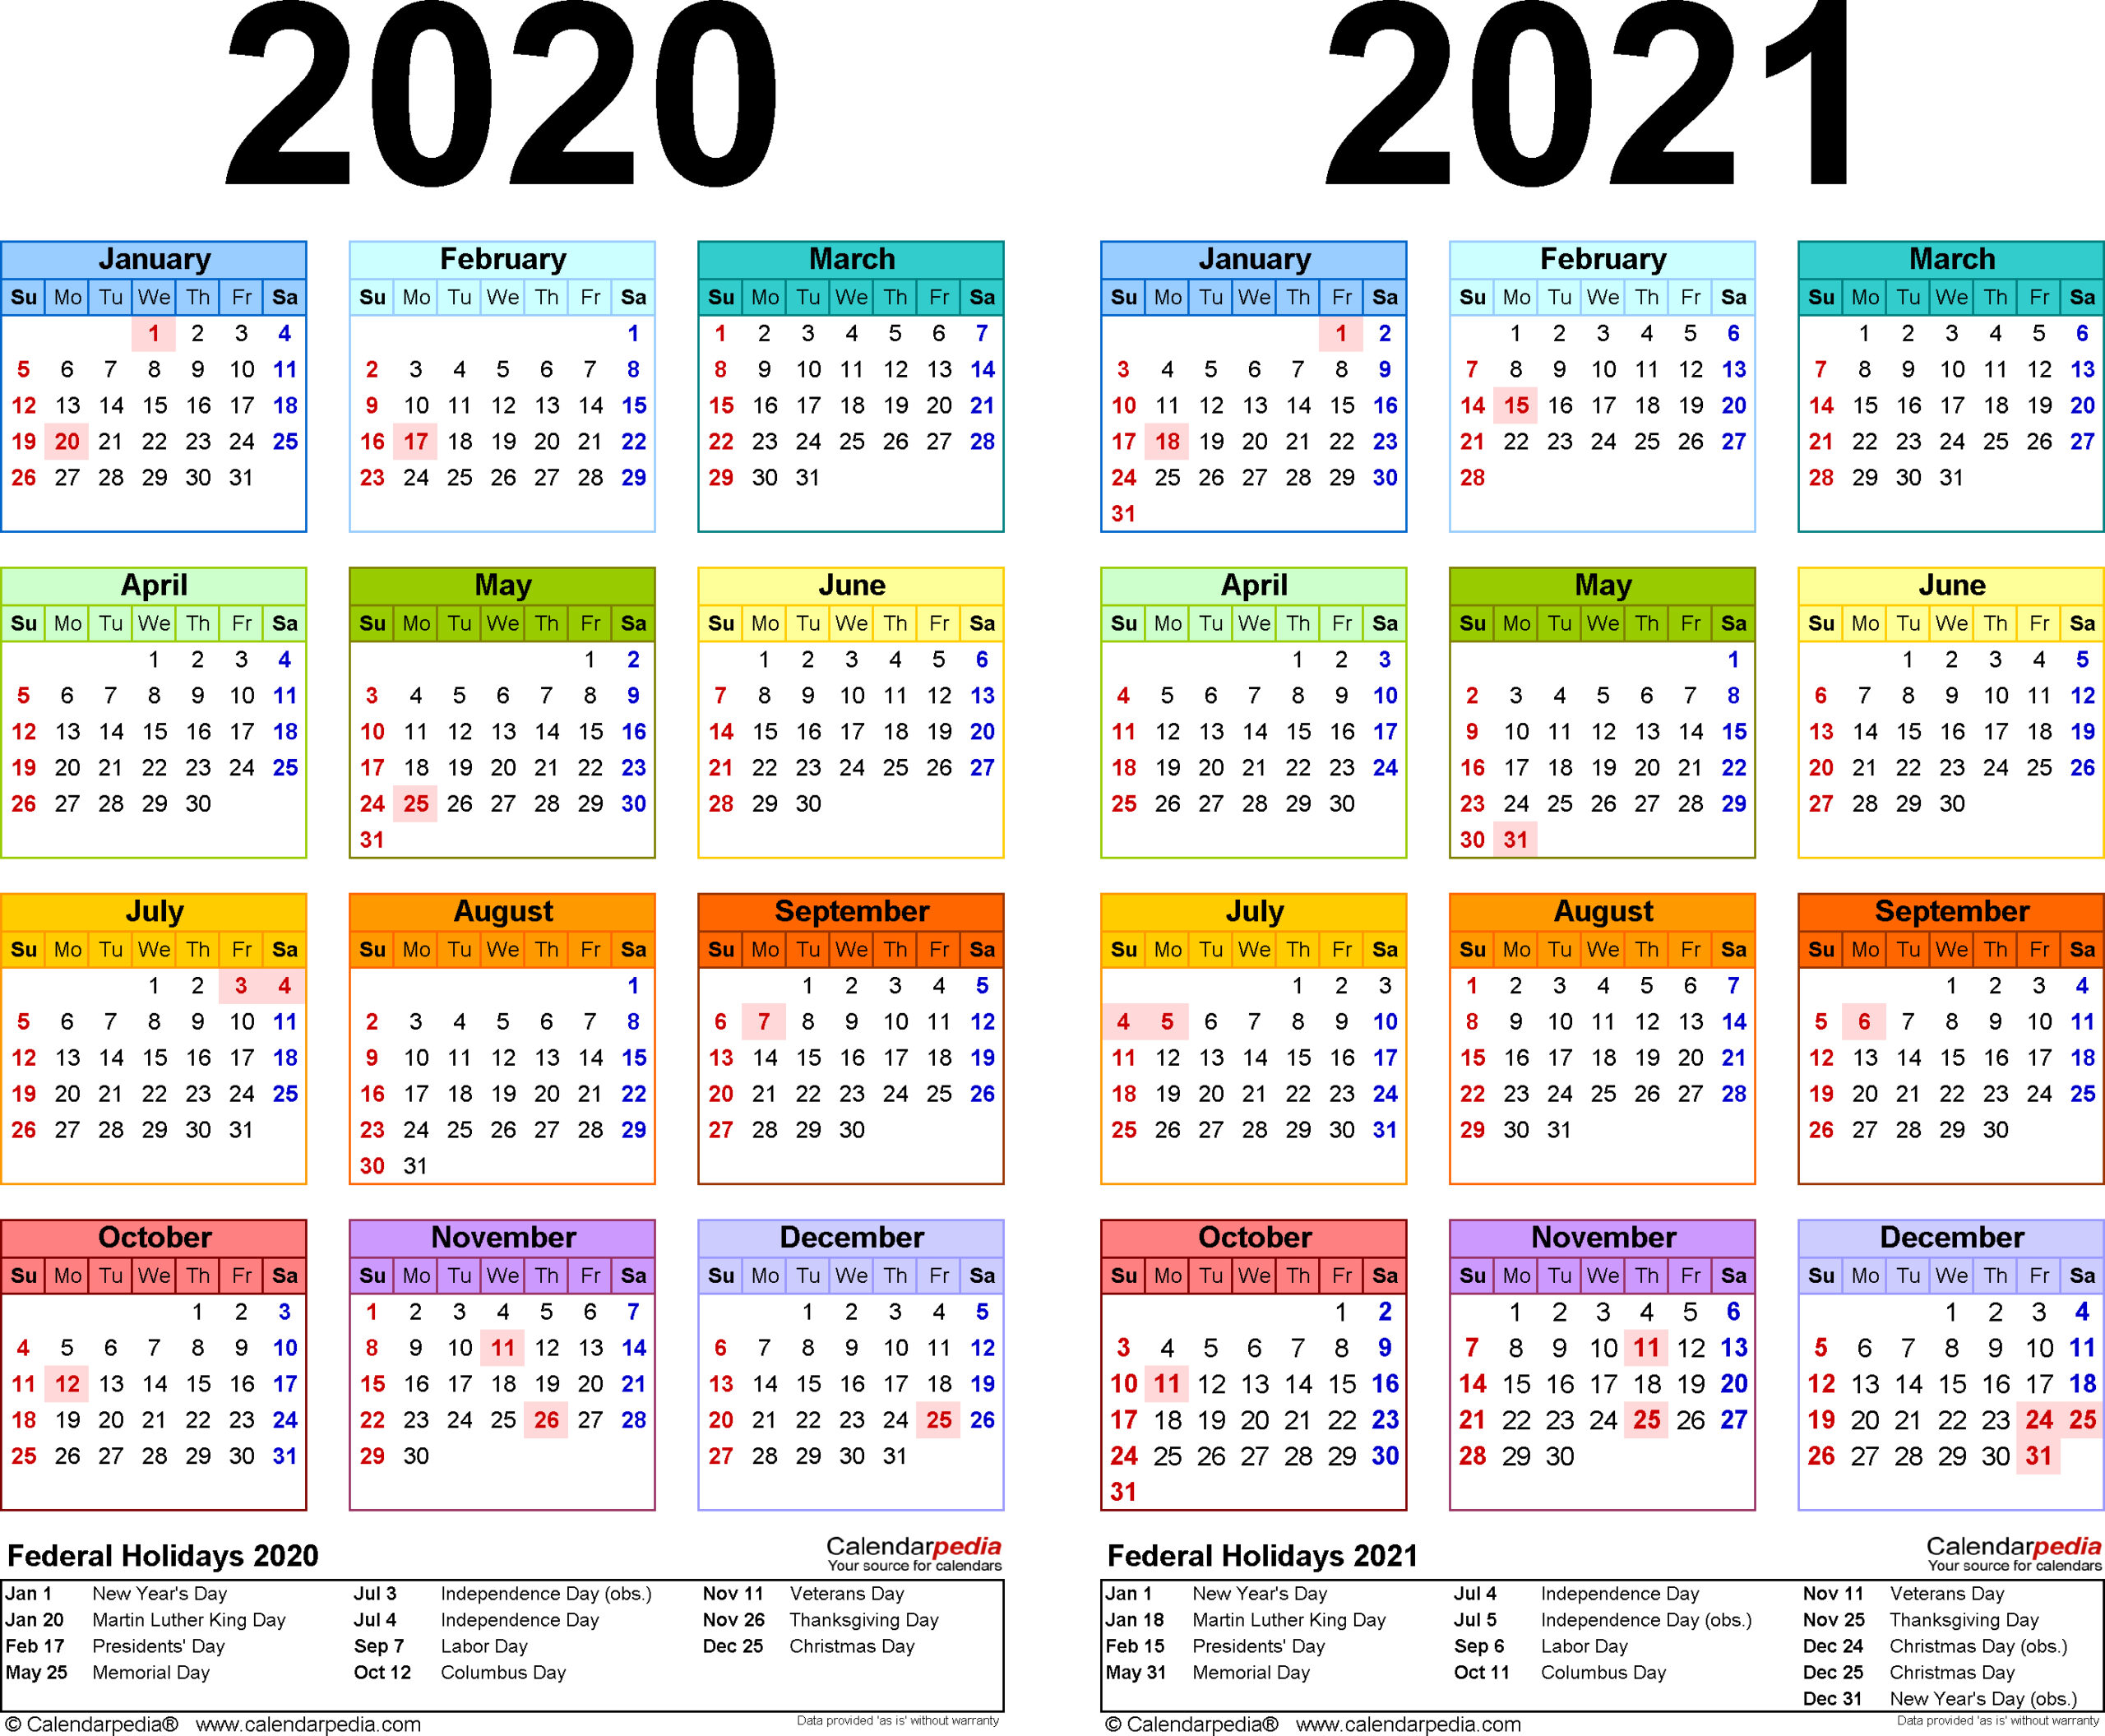 Calendarpedia 2020 Excel | Calendar For Planning